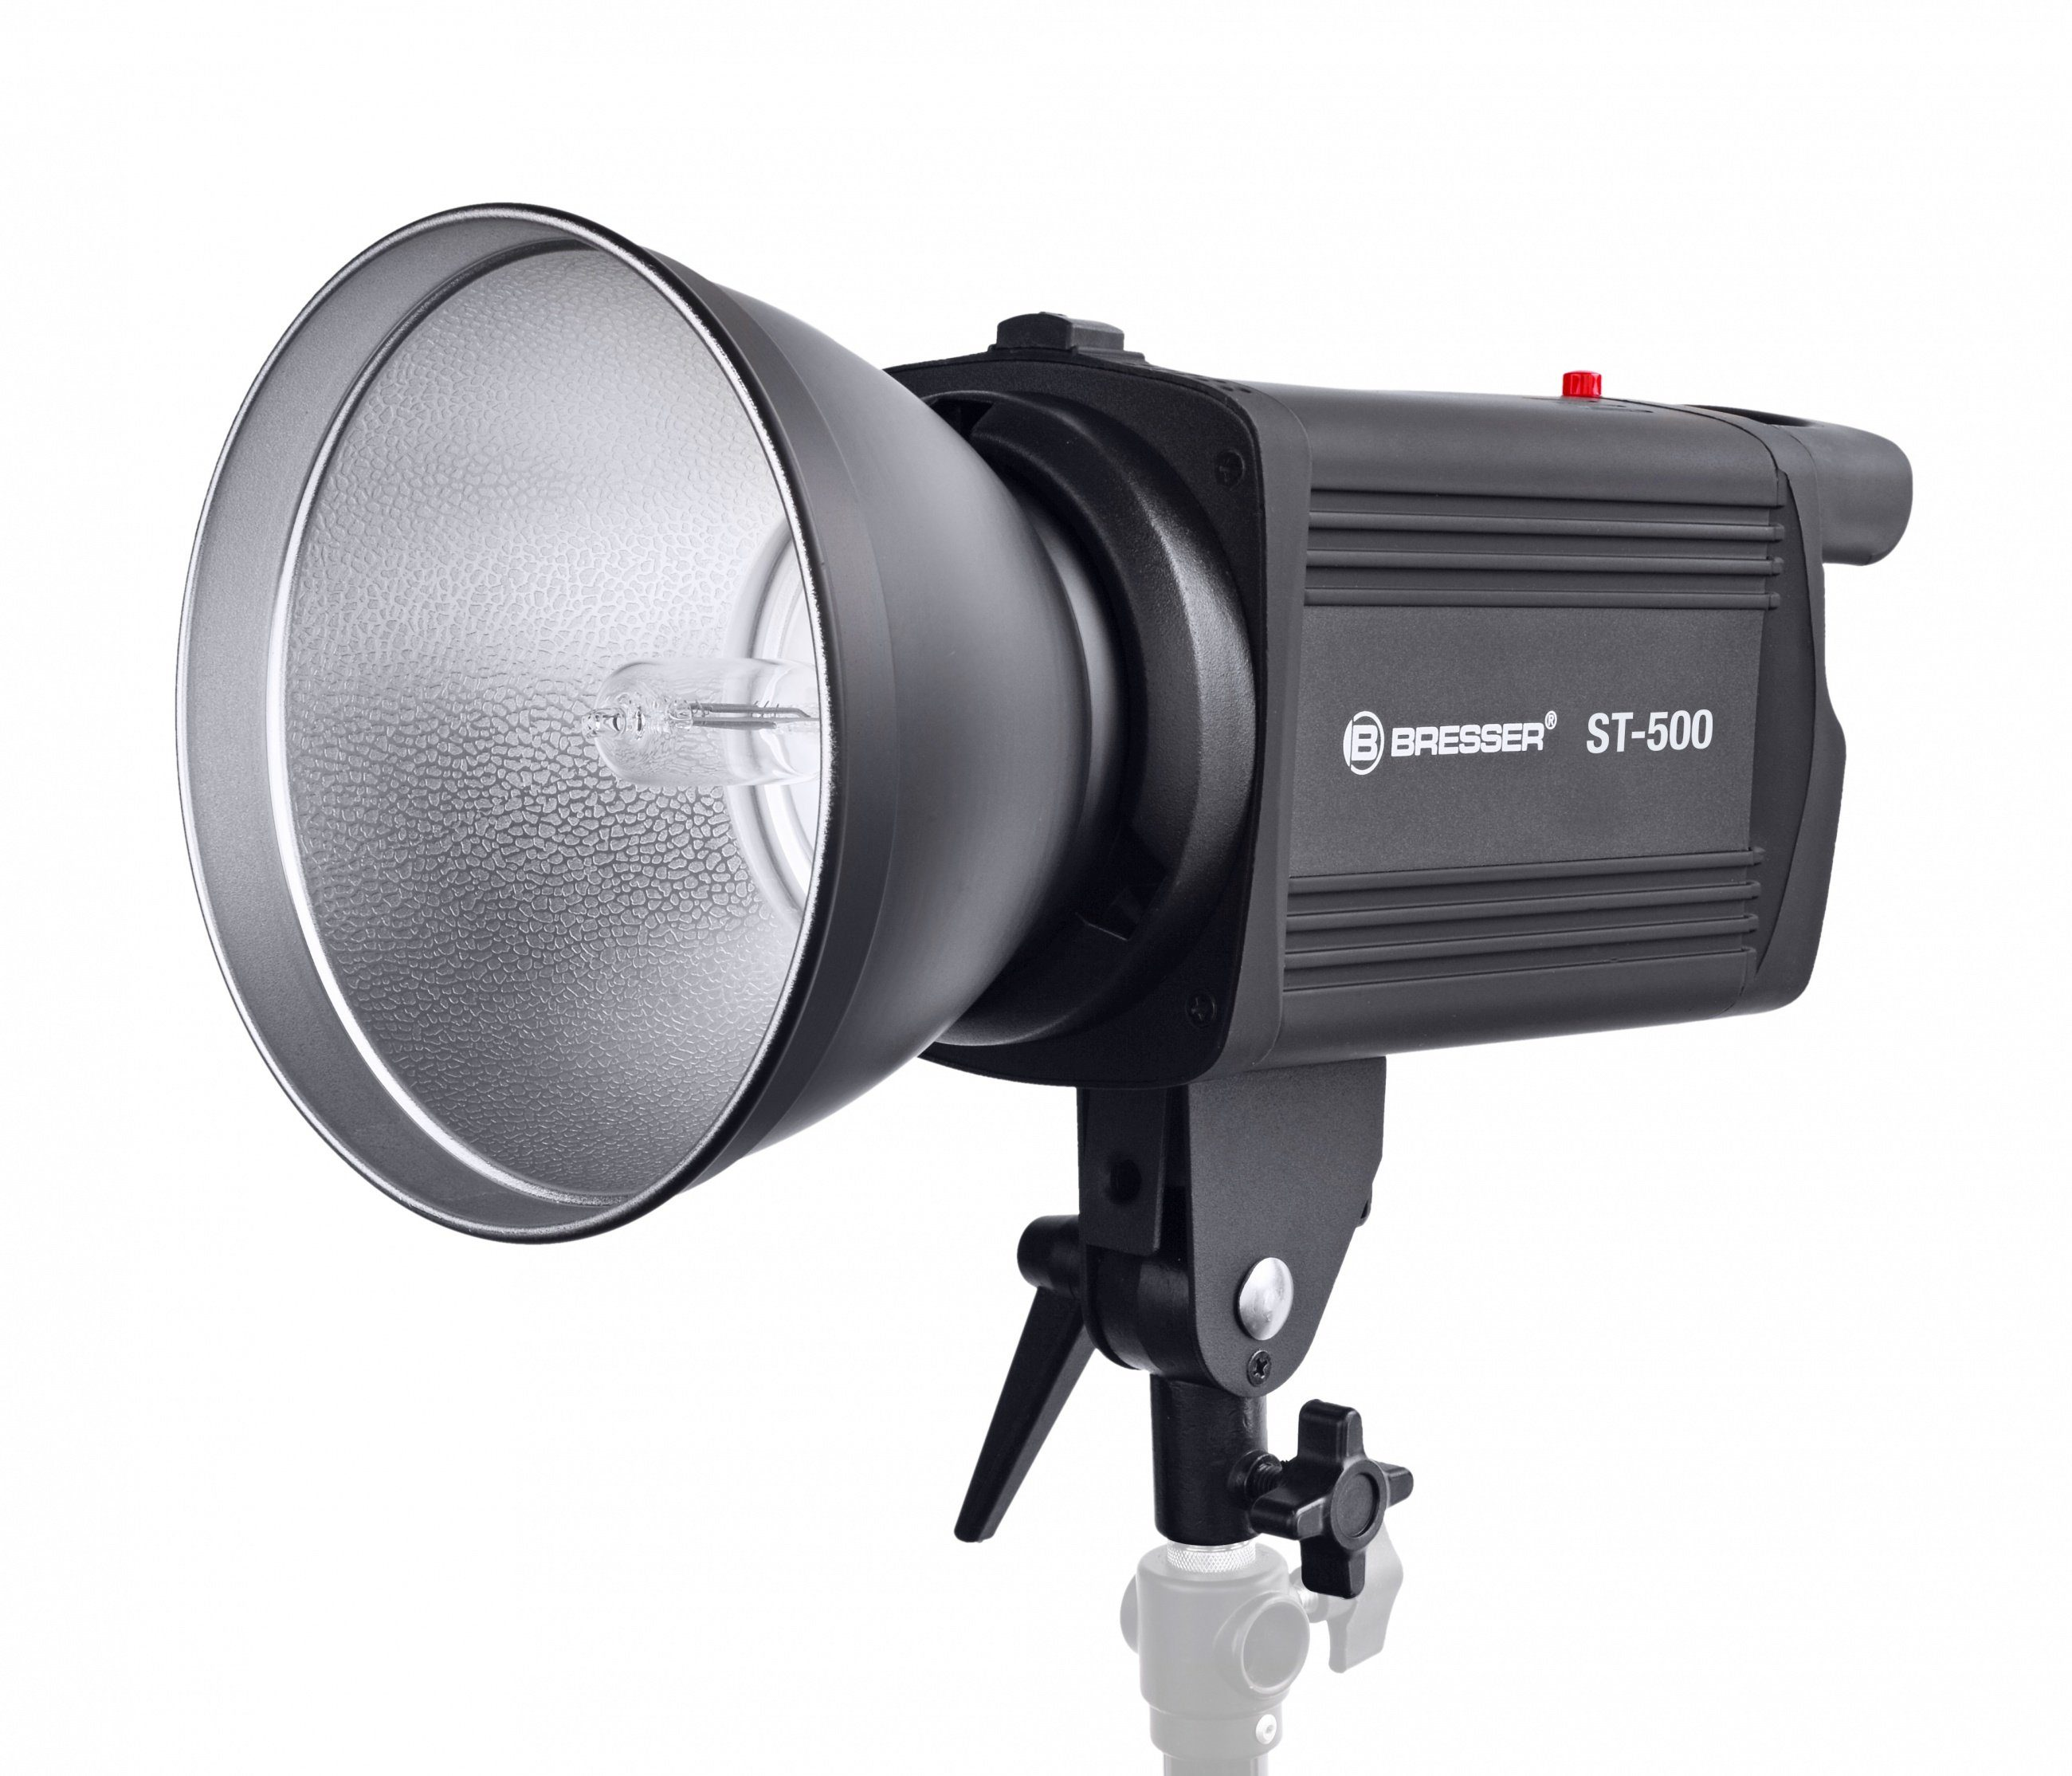 Bresser Fotostudio »ST-500 Halogen-Studiolampe 500W«